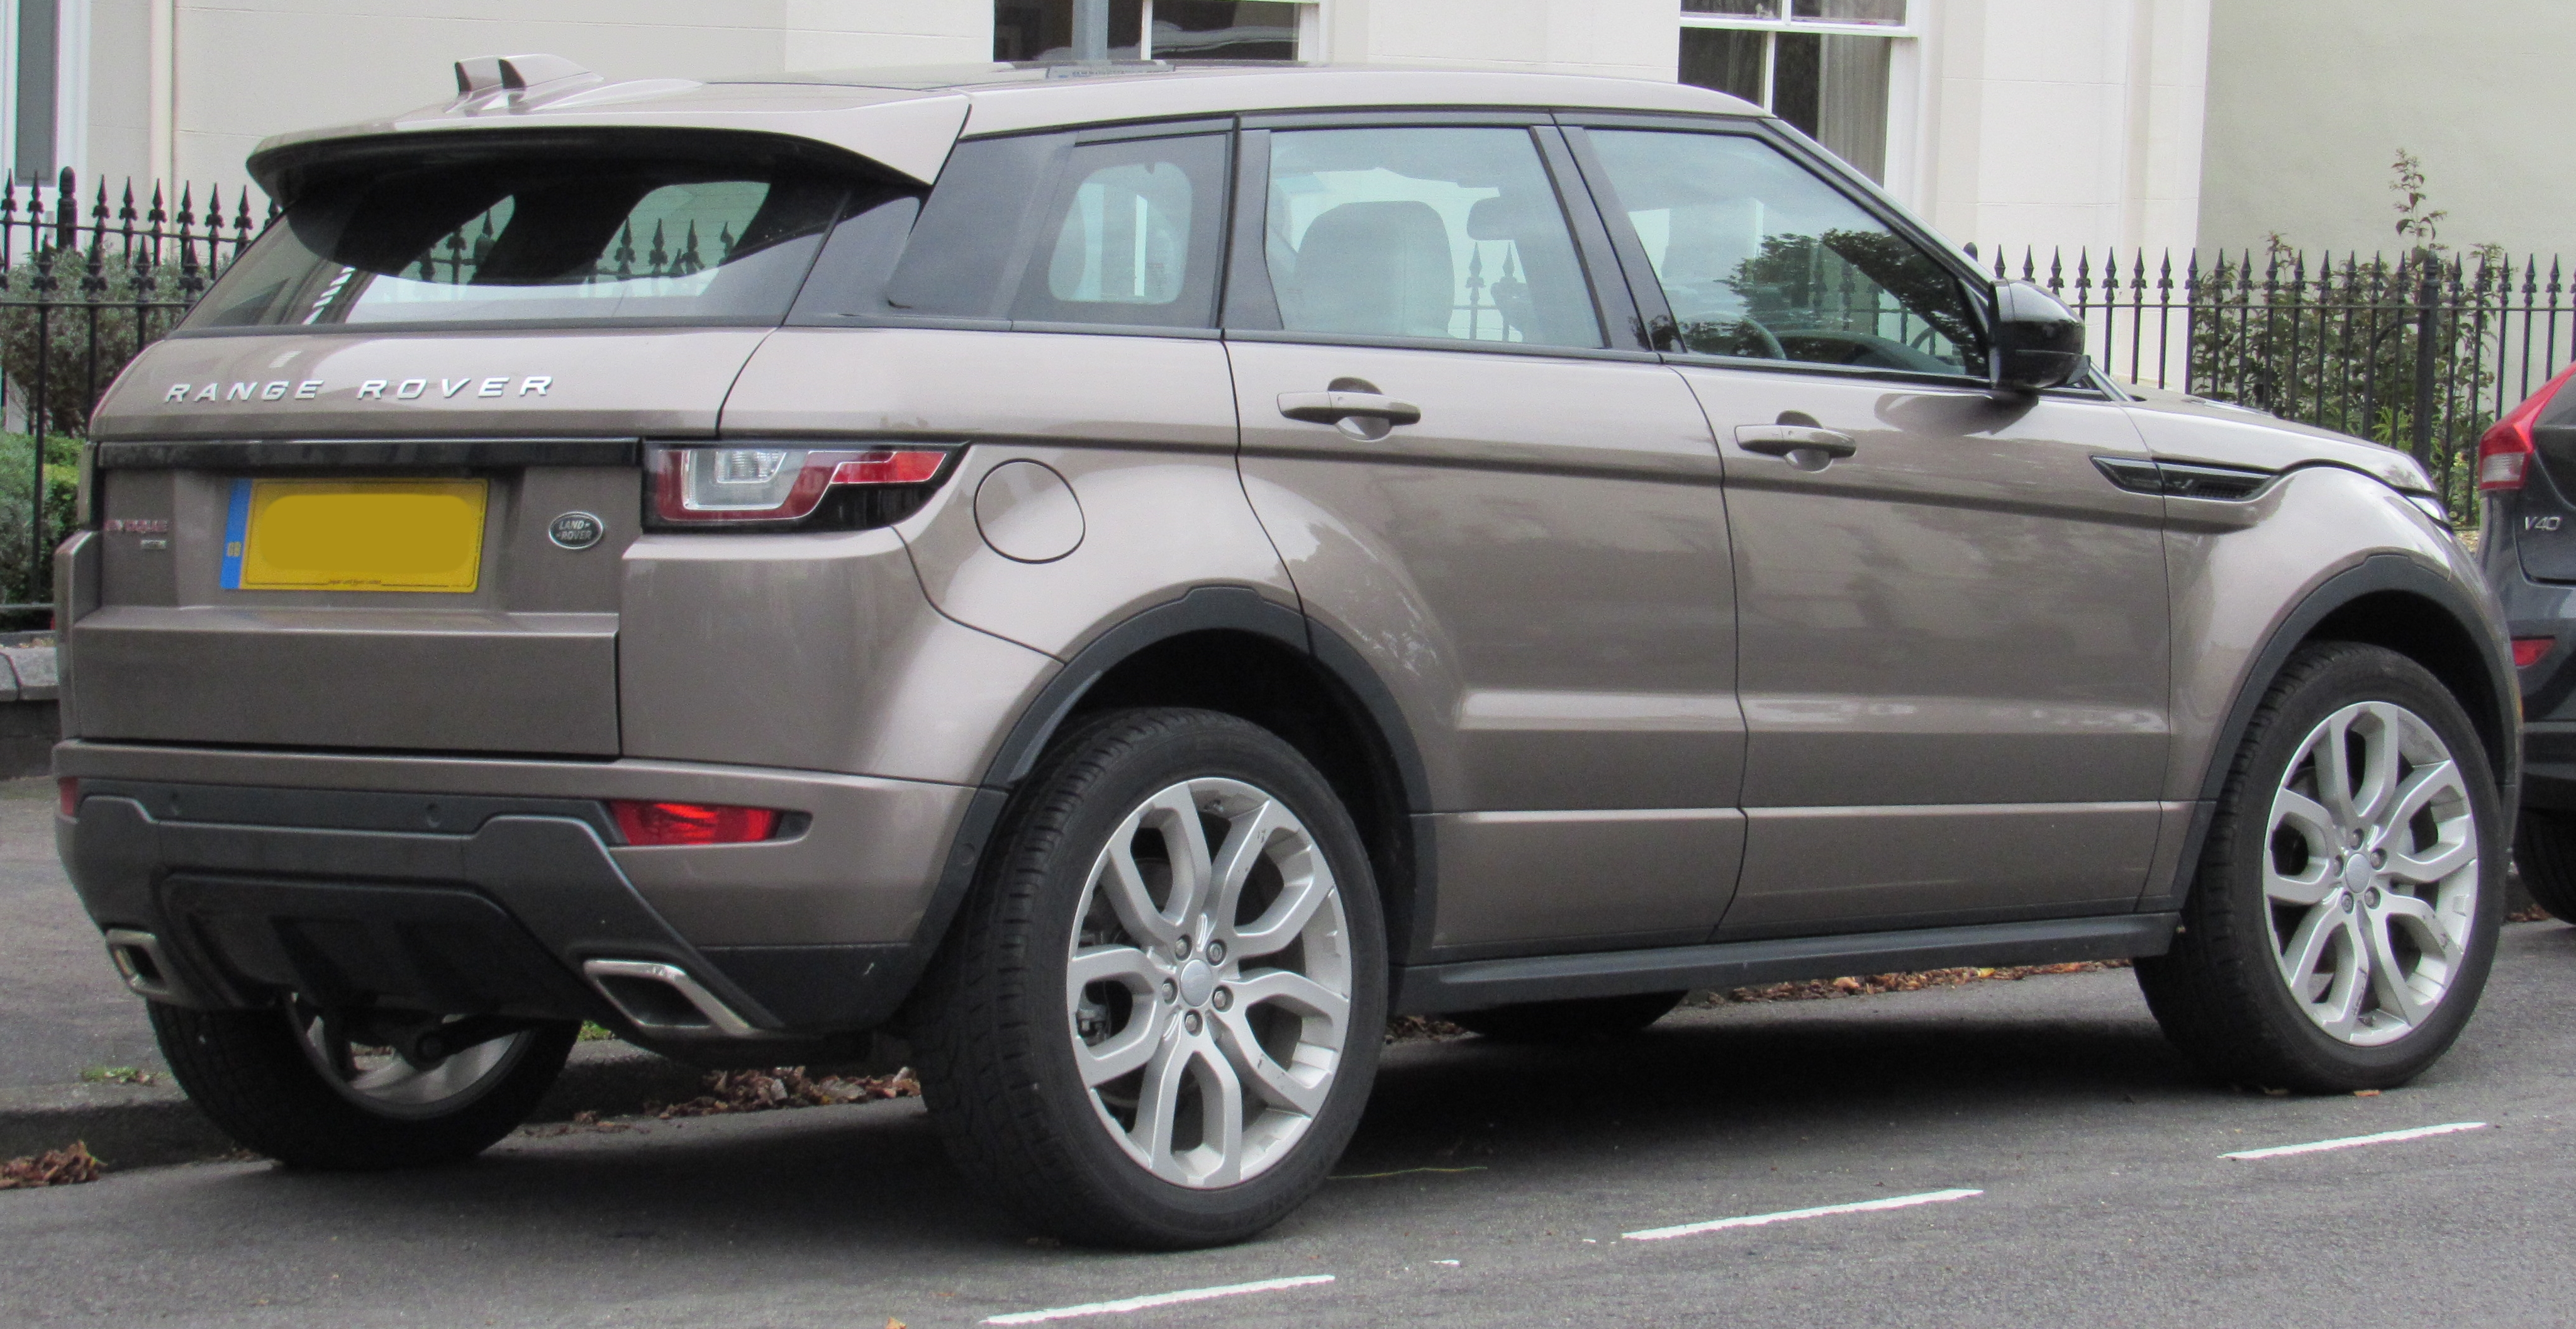 Range Rover Evoque HSE (photo courtesy of Vauxford)